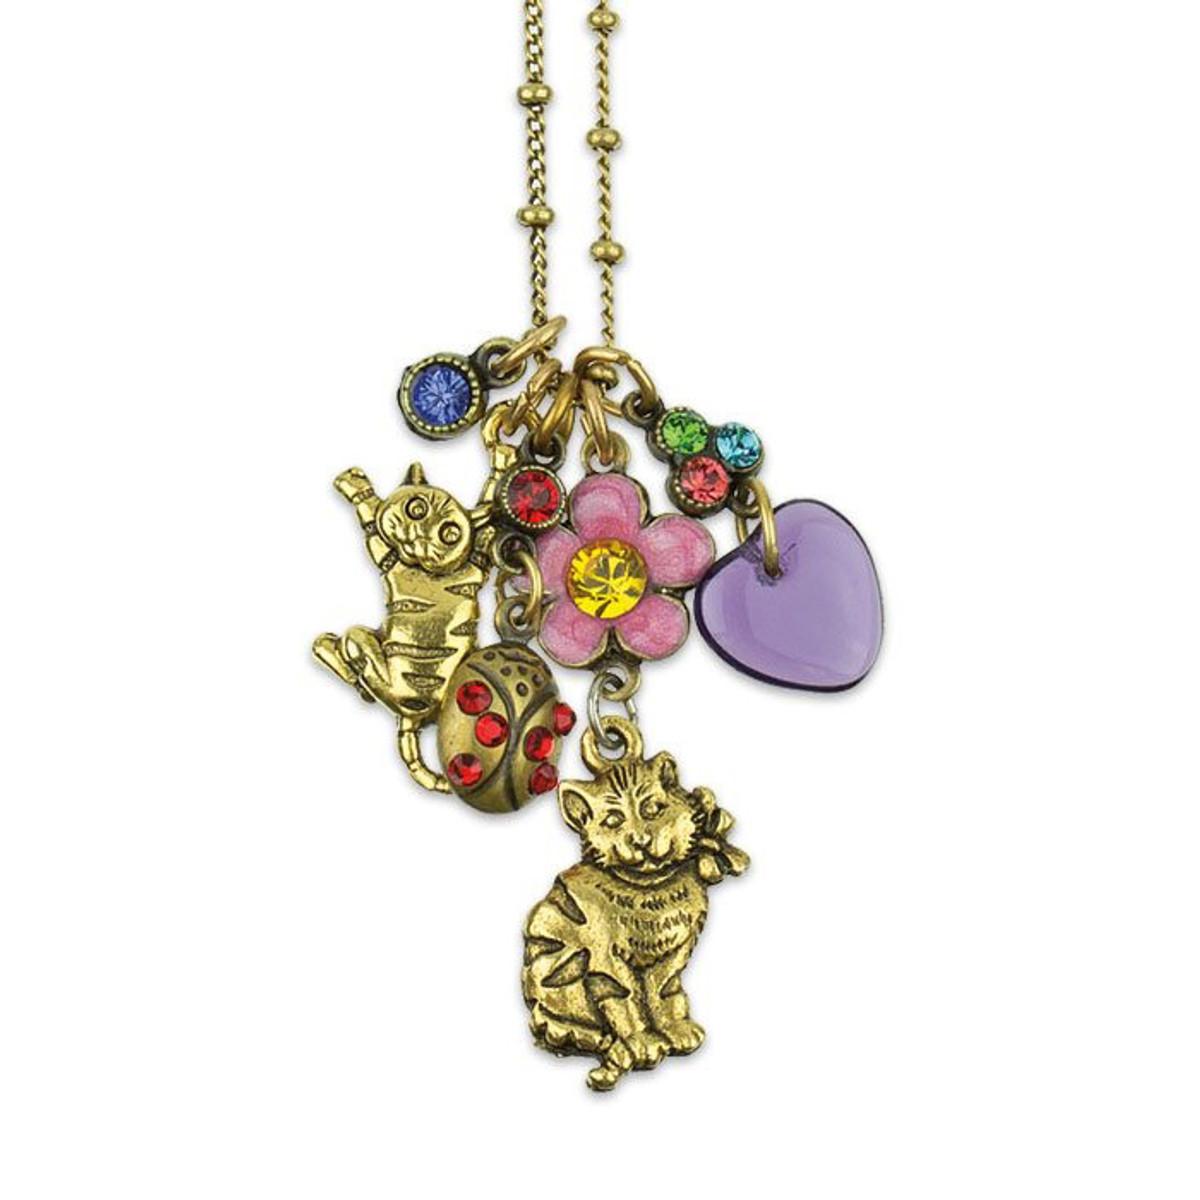 Loving My Cat Jumble Charm Necklace